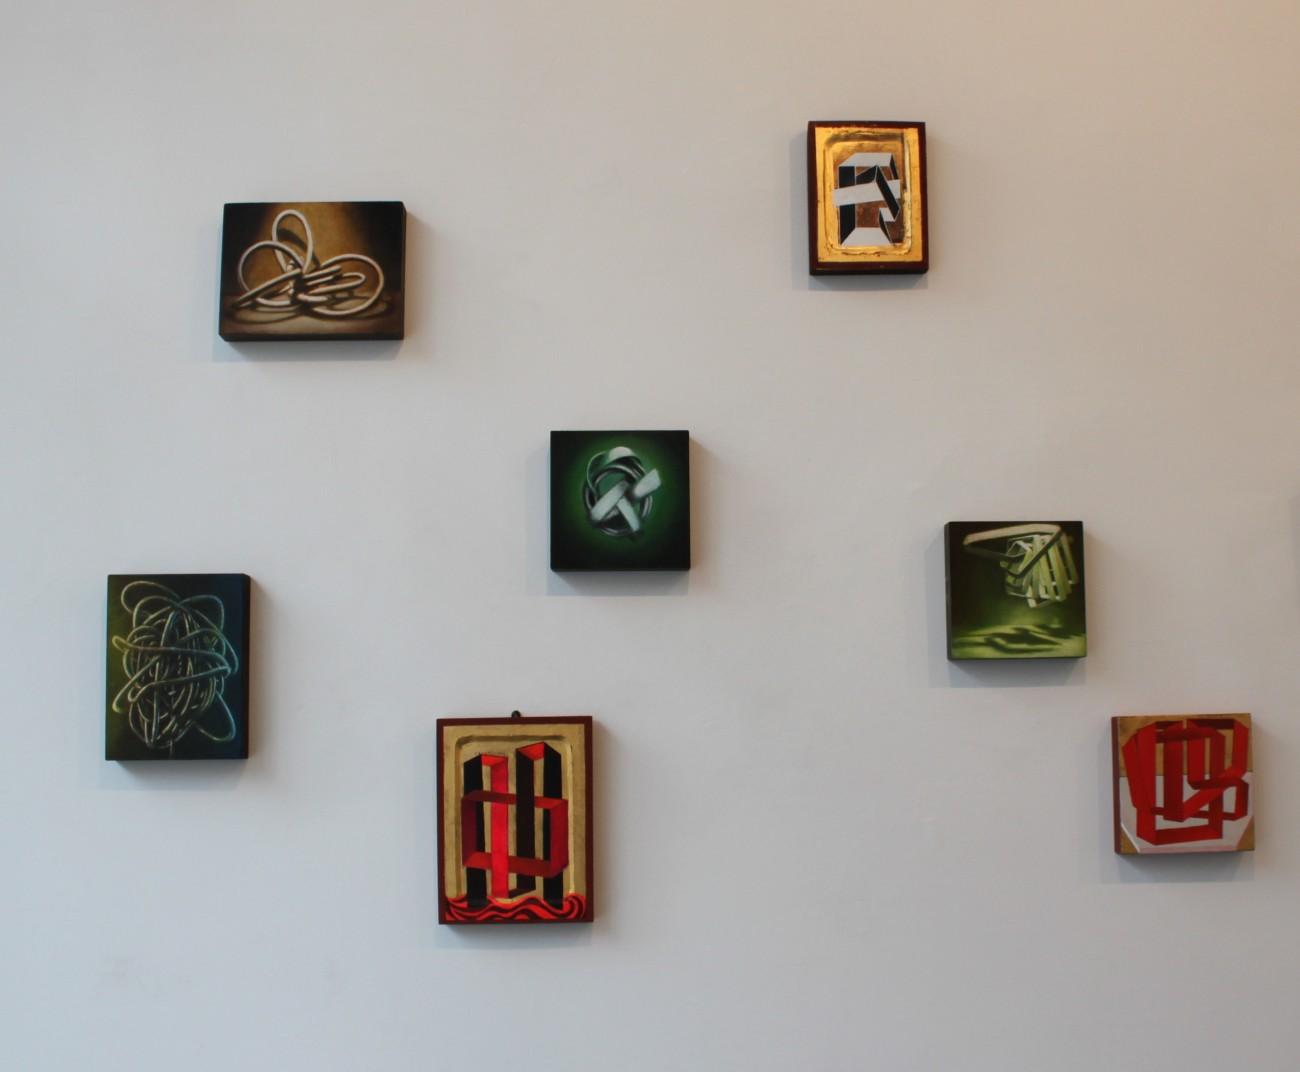 Wolfgang Leidhold, Knots and Icons, Installation view left part, 2014 Knoten und Ikonen, Installationsansicht linker Teil, 2014